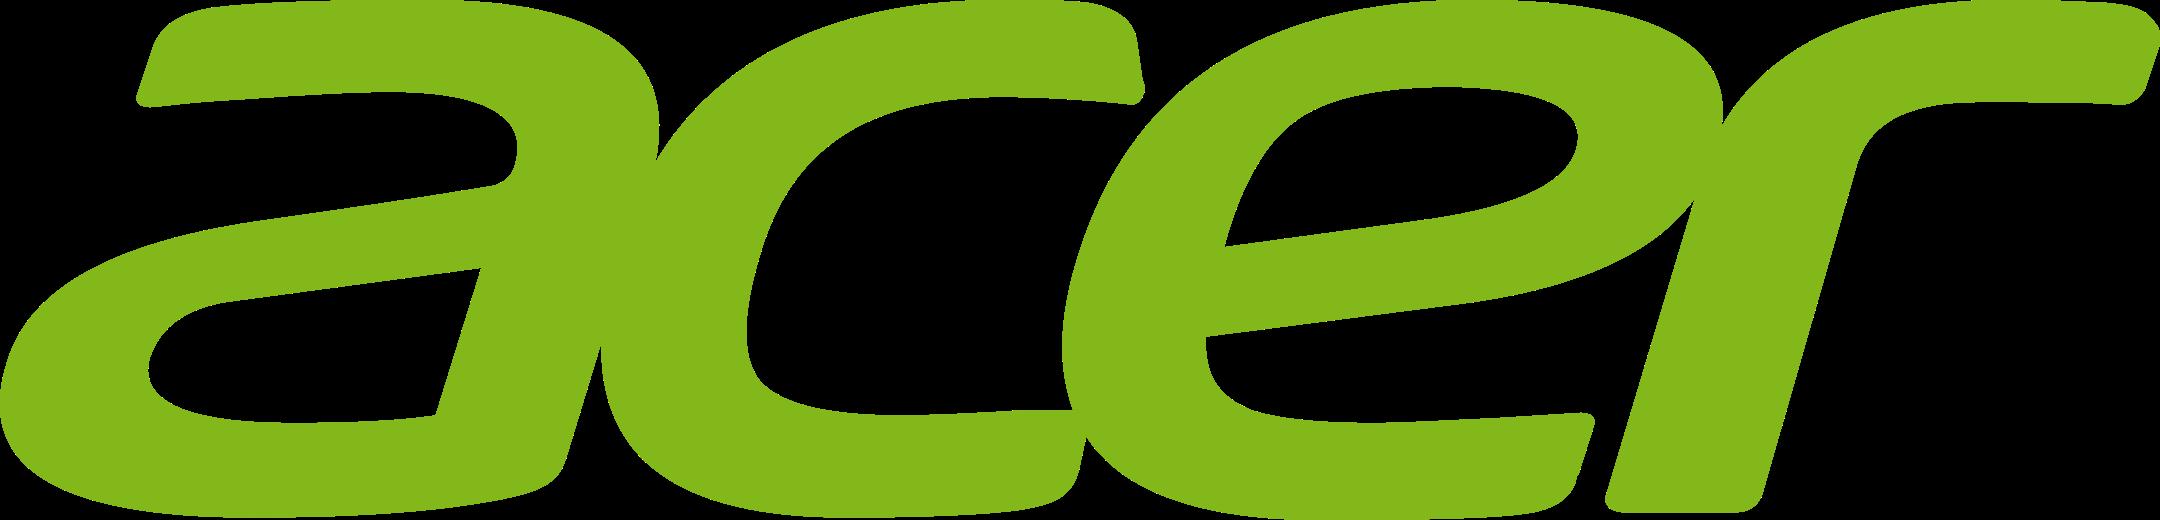 acer logo 1 1 - Acer Logo